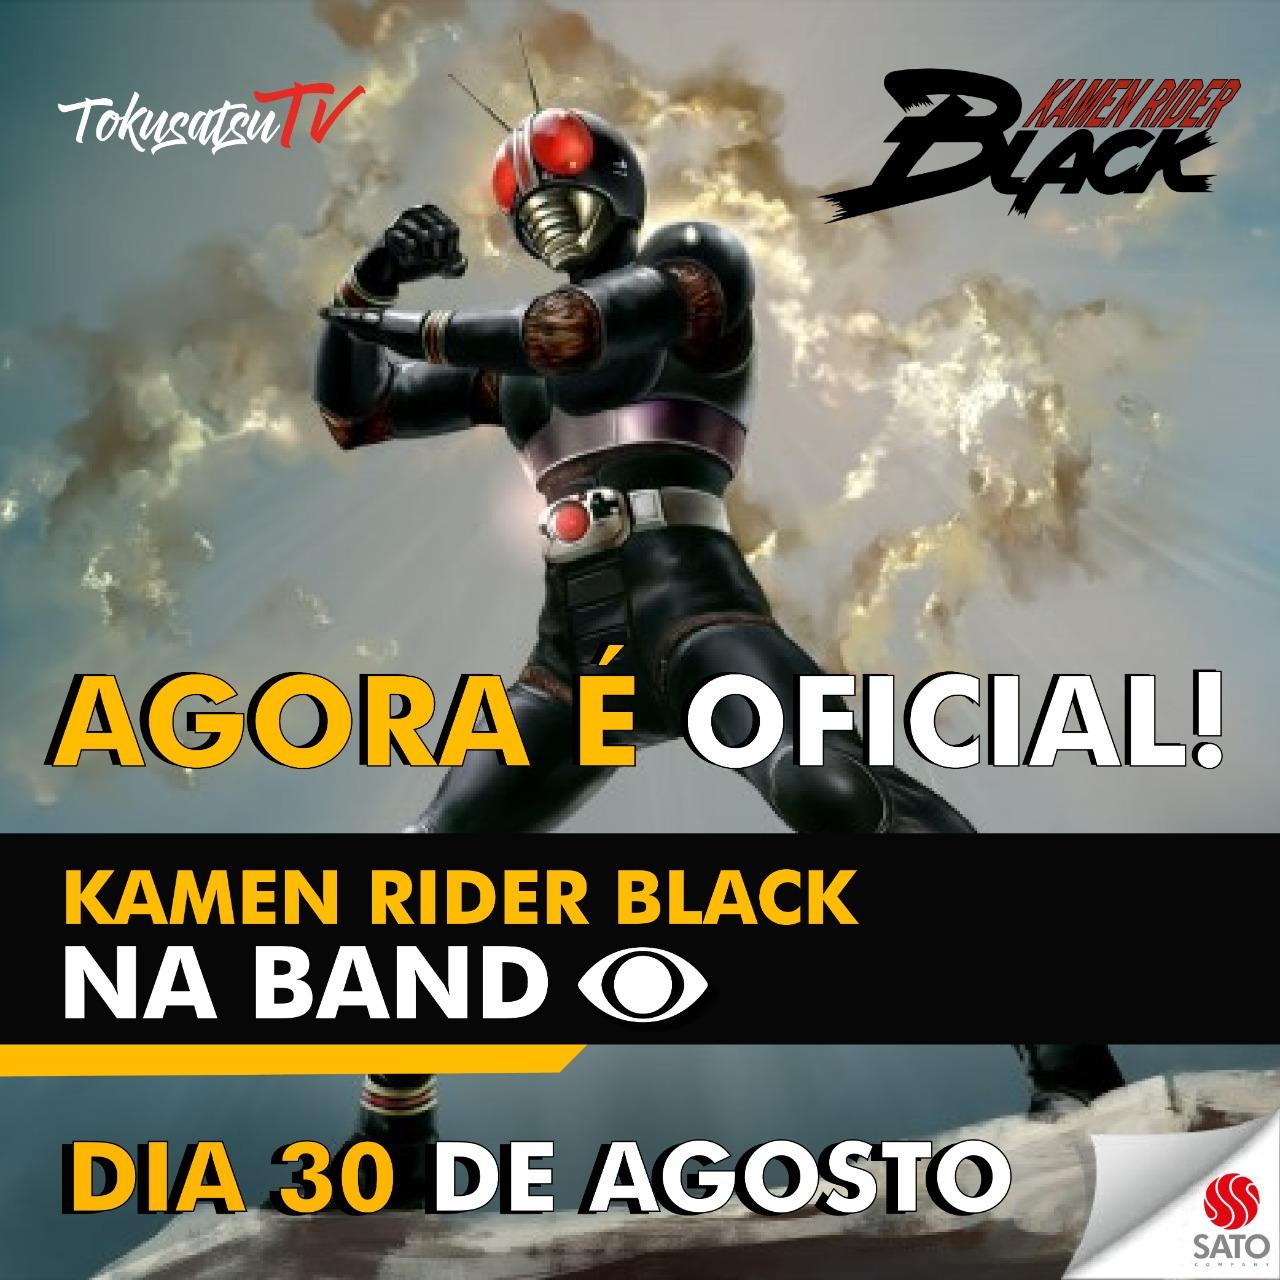 black kamen rider na band